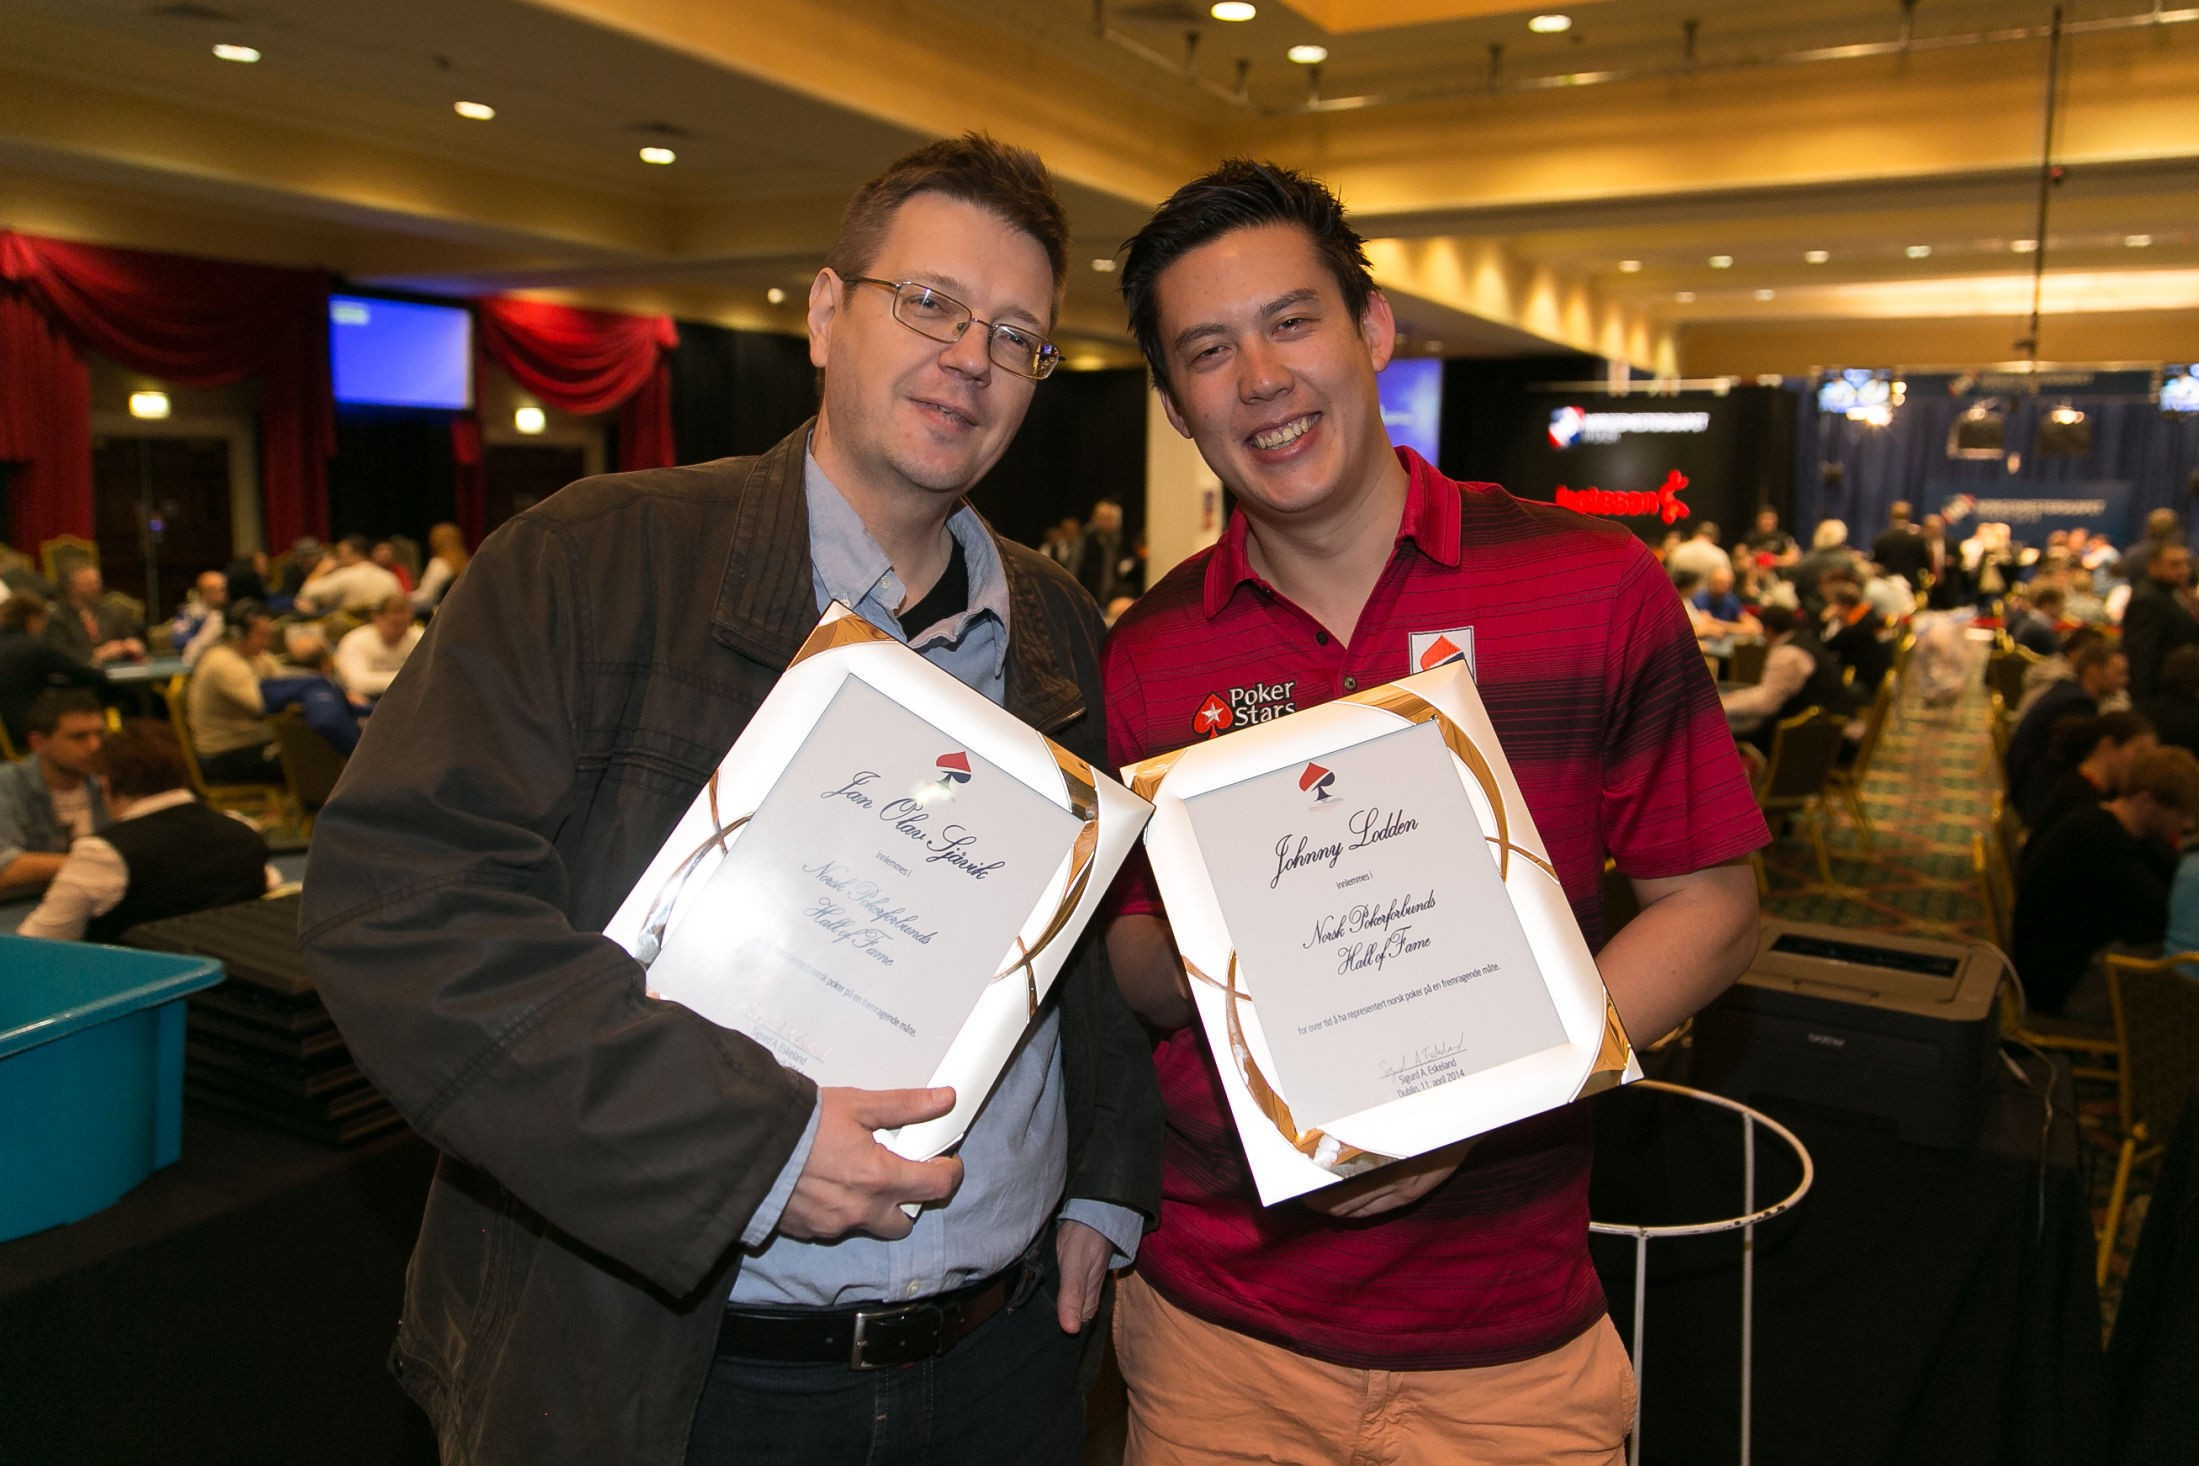 NYE MEDLEMMER: Jan Olav Sjåvik og Johnny Lodden er Norsk pokerforbunds